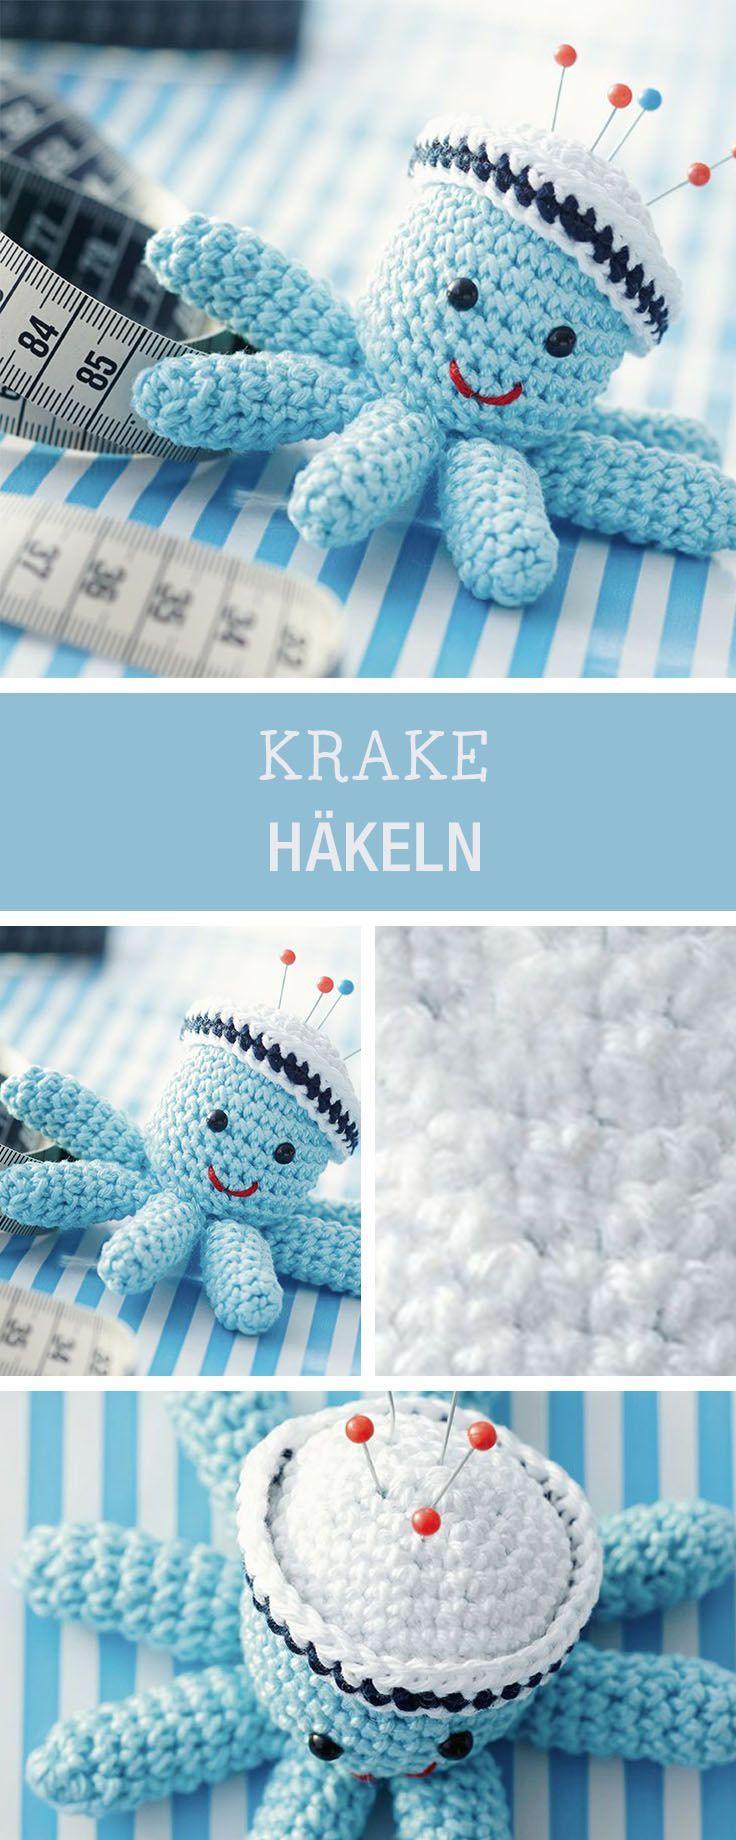 DIY-Anleitung: Krake als Nadelkissen häkeln via DaWanda.com | Krake ...